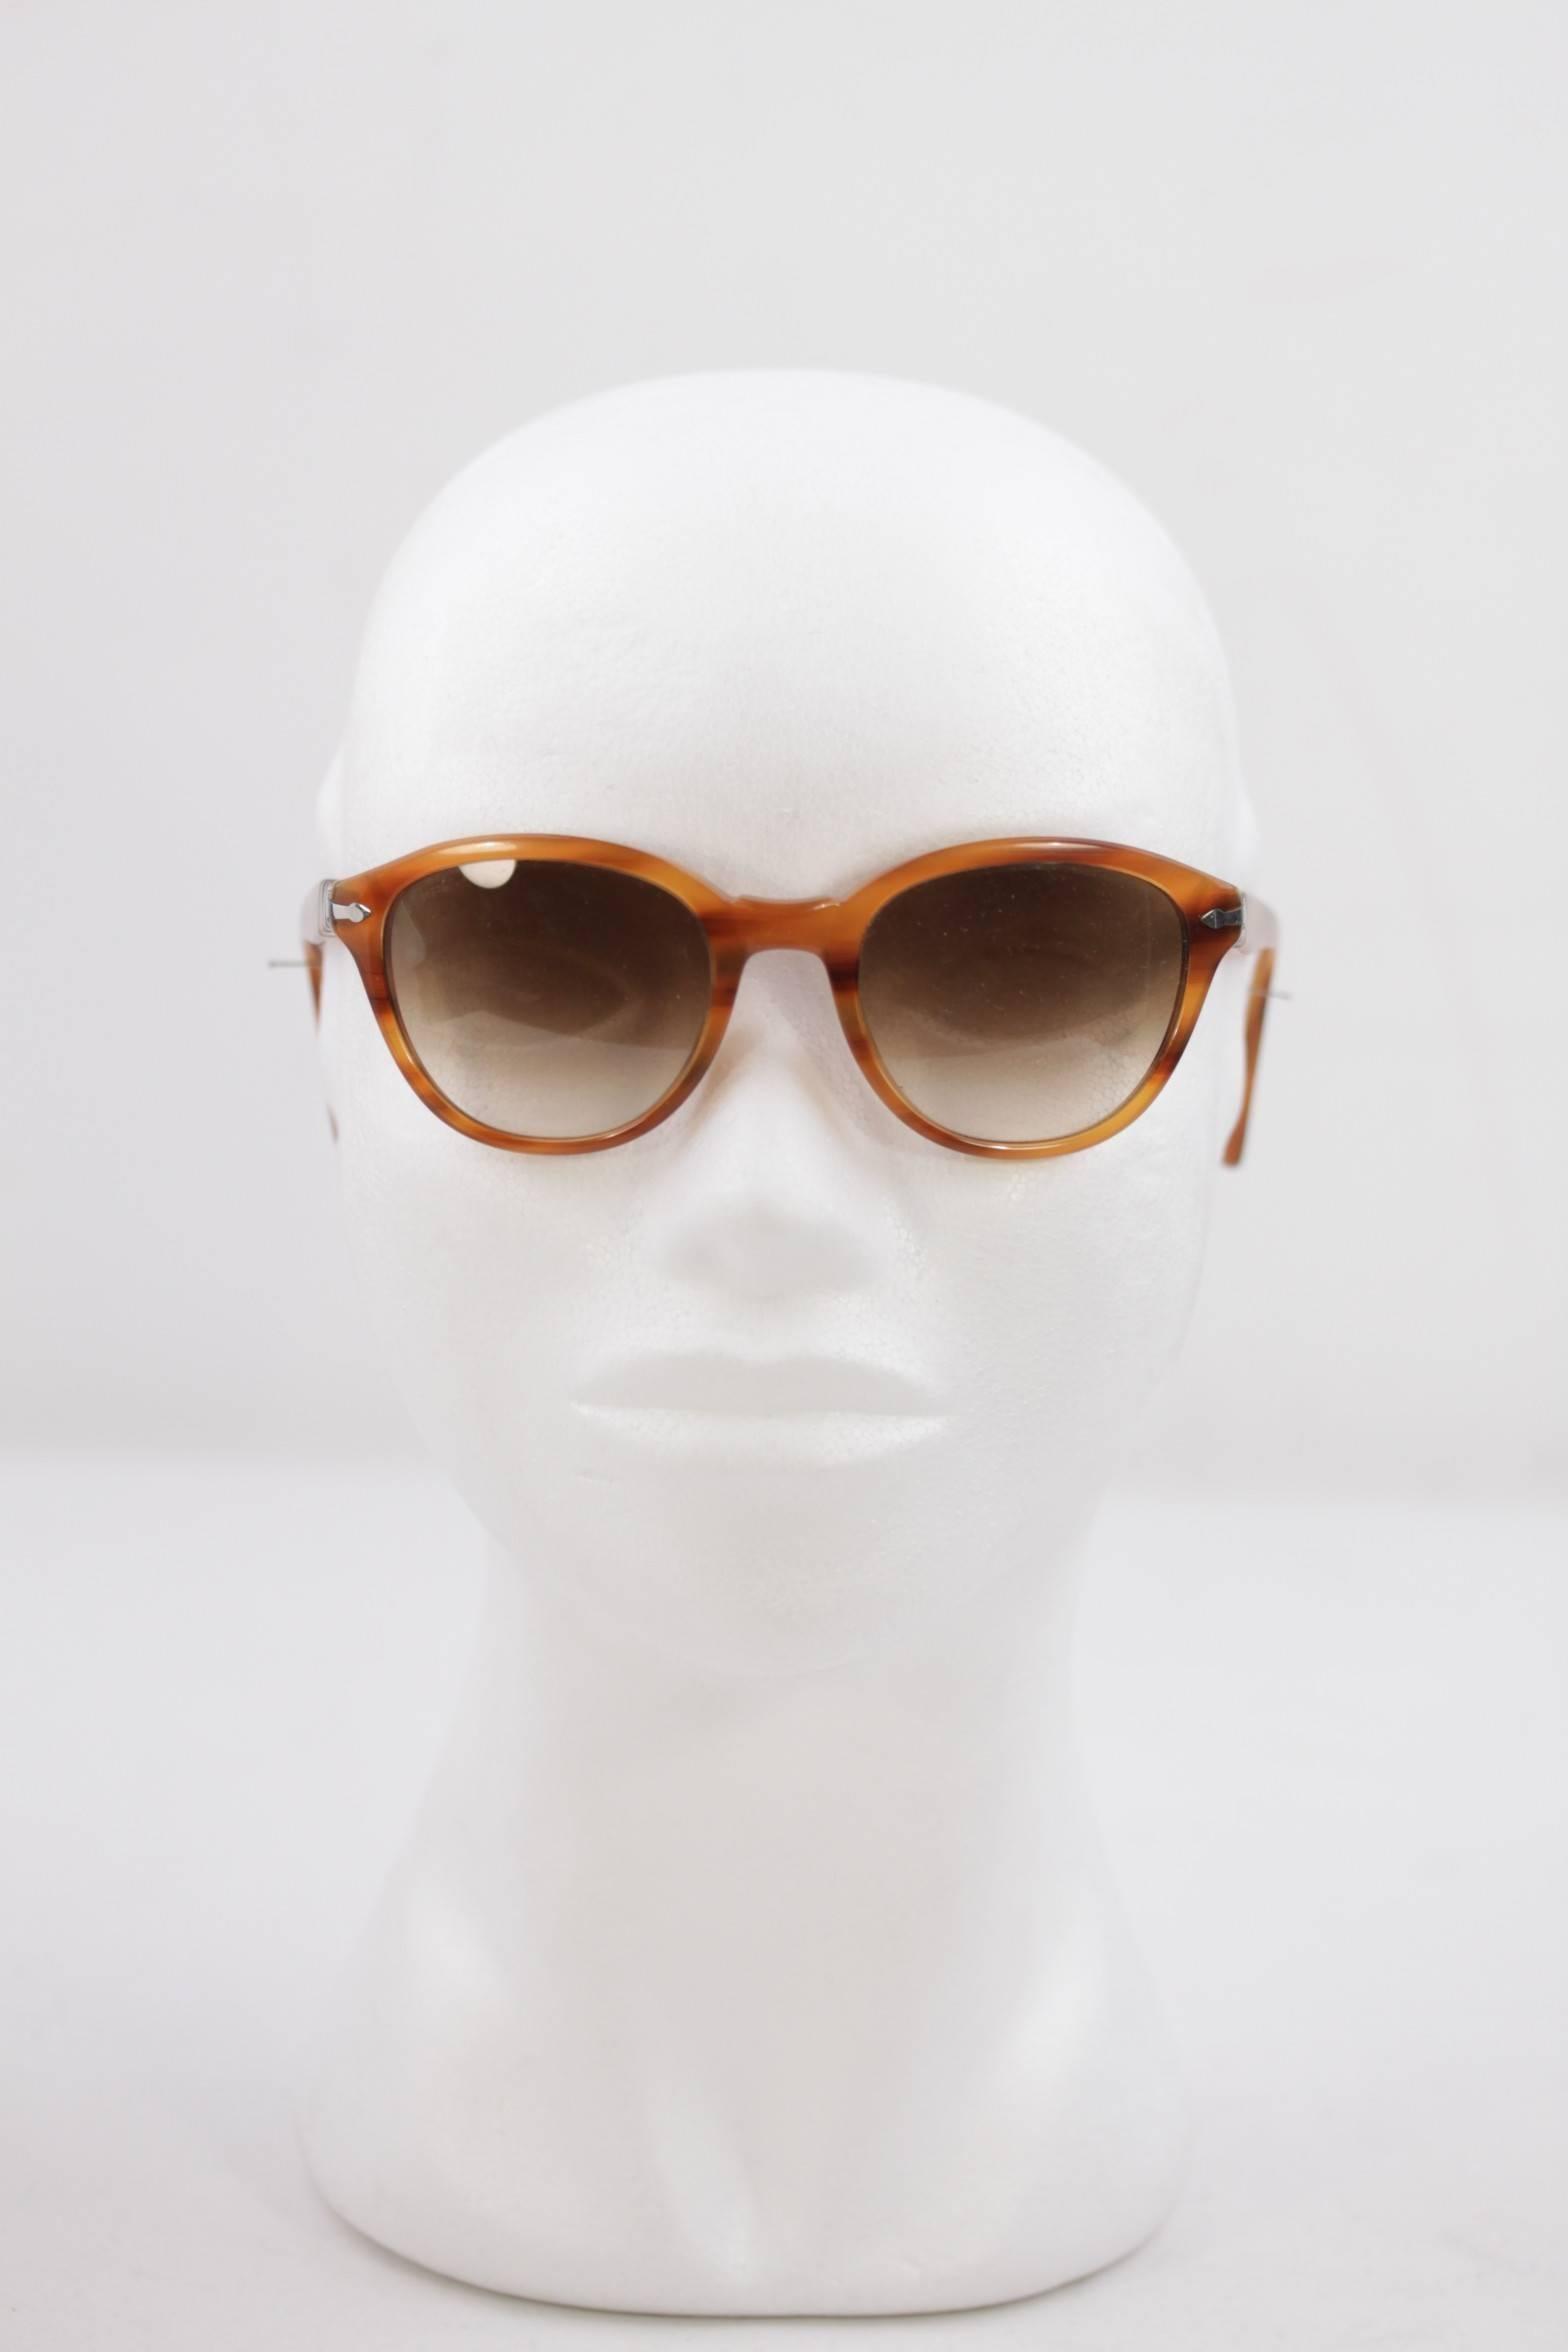 391f287174369 PERSOL Tan SUNGLASSES 3025 S Capri Edition EYEWEAR Eyeglasses SHADES For  Sale at 1stdibs